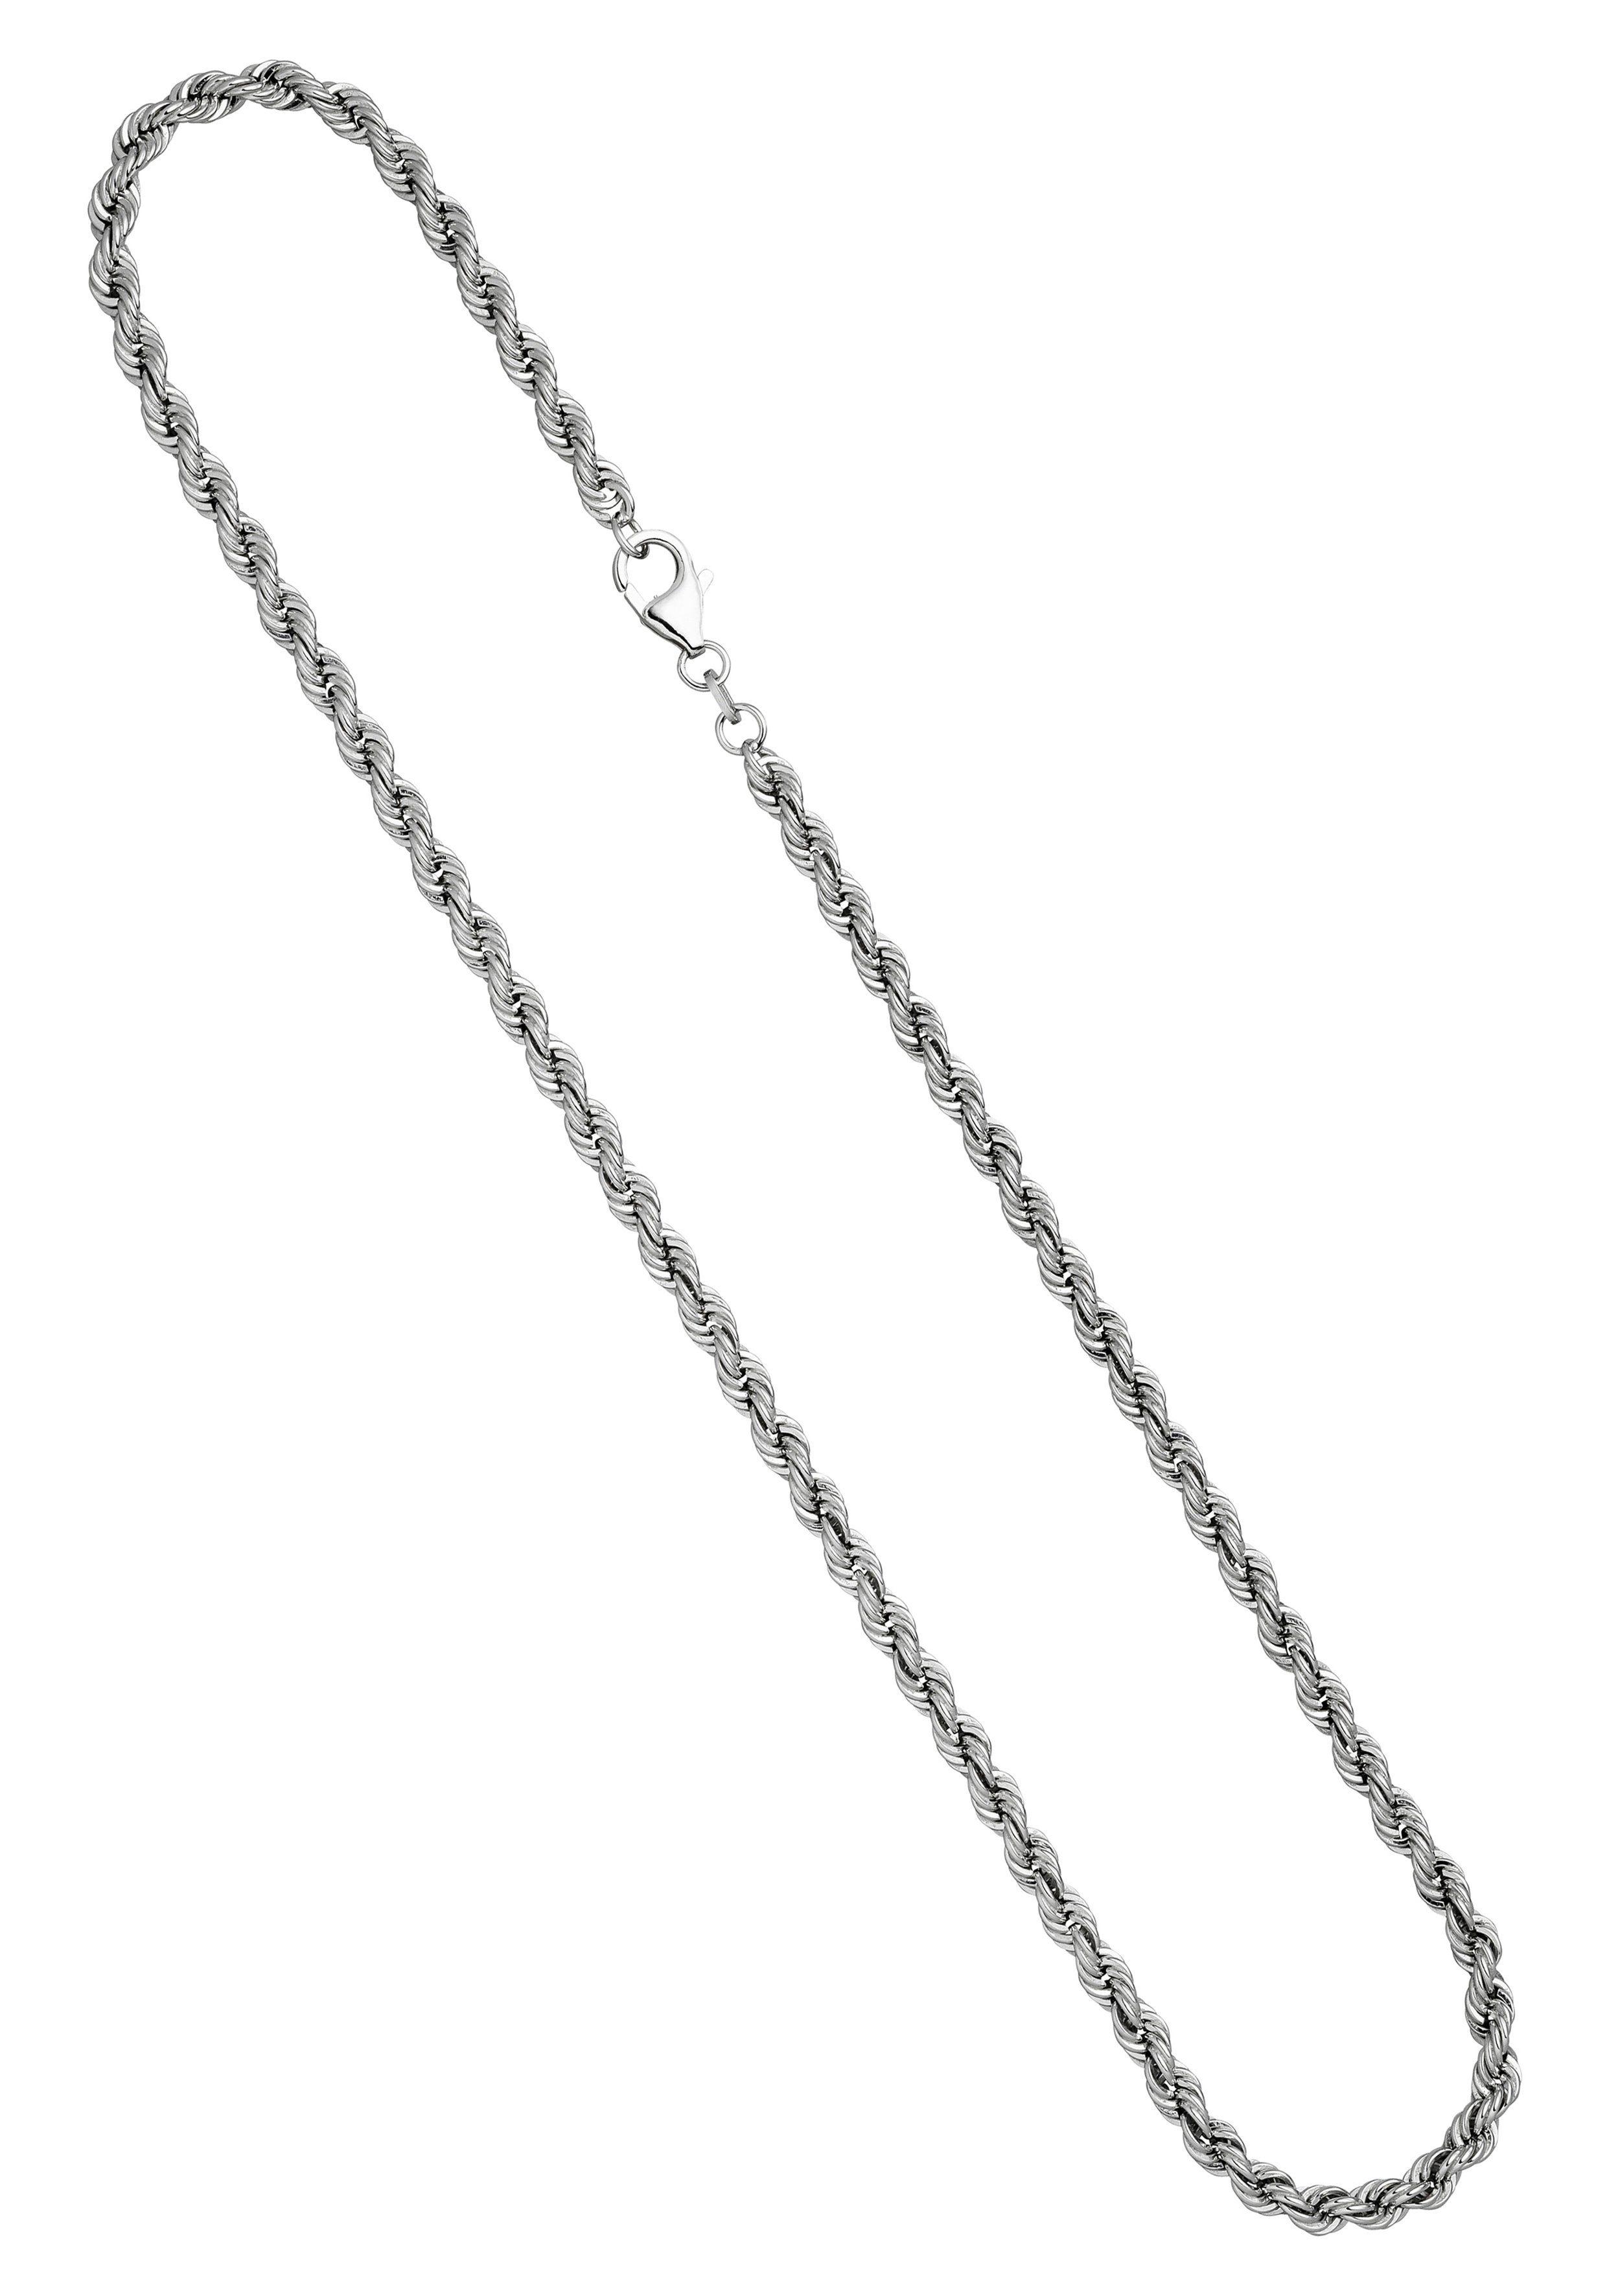 Kette  45 cm  Kordel Kette   925  Sterling Silber